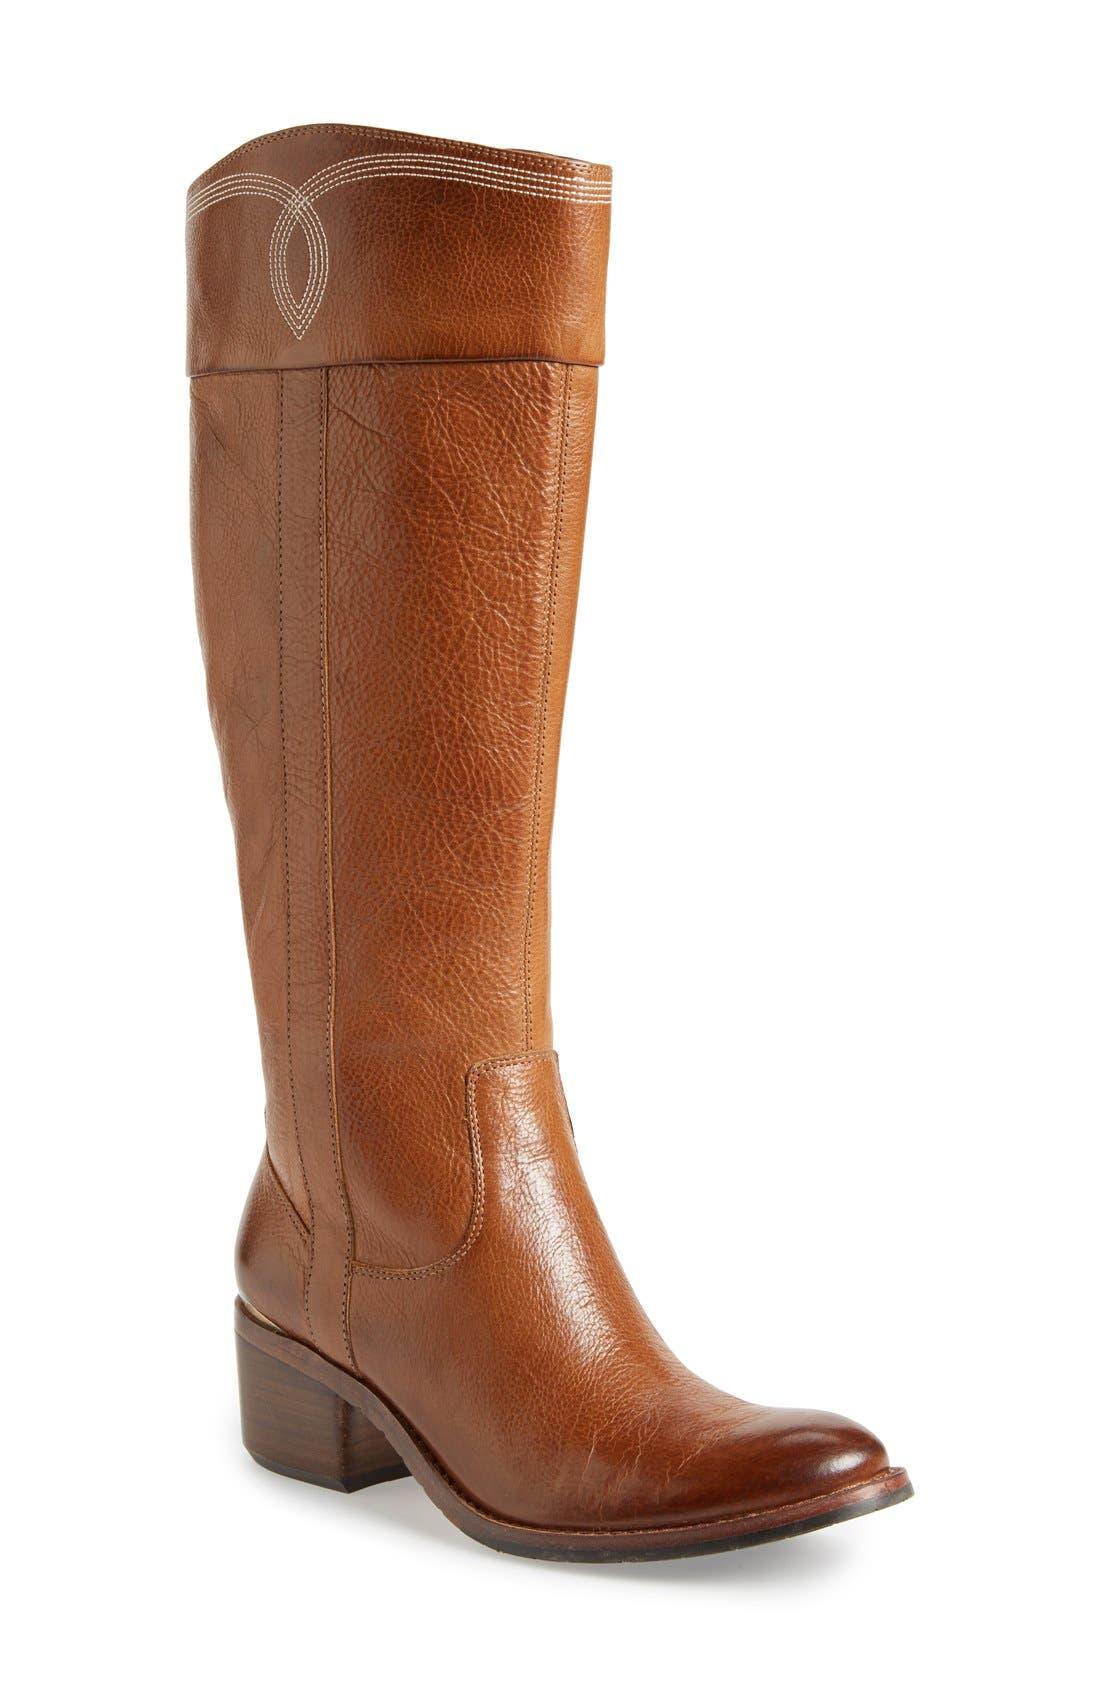 Main Image - Donald J Pliner'Willi' Tall Boot (Women)